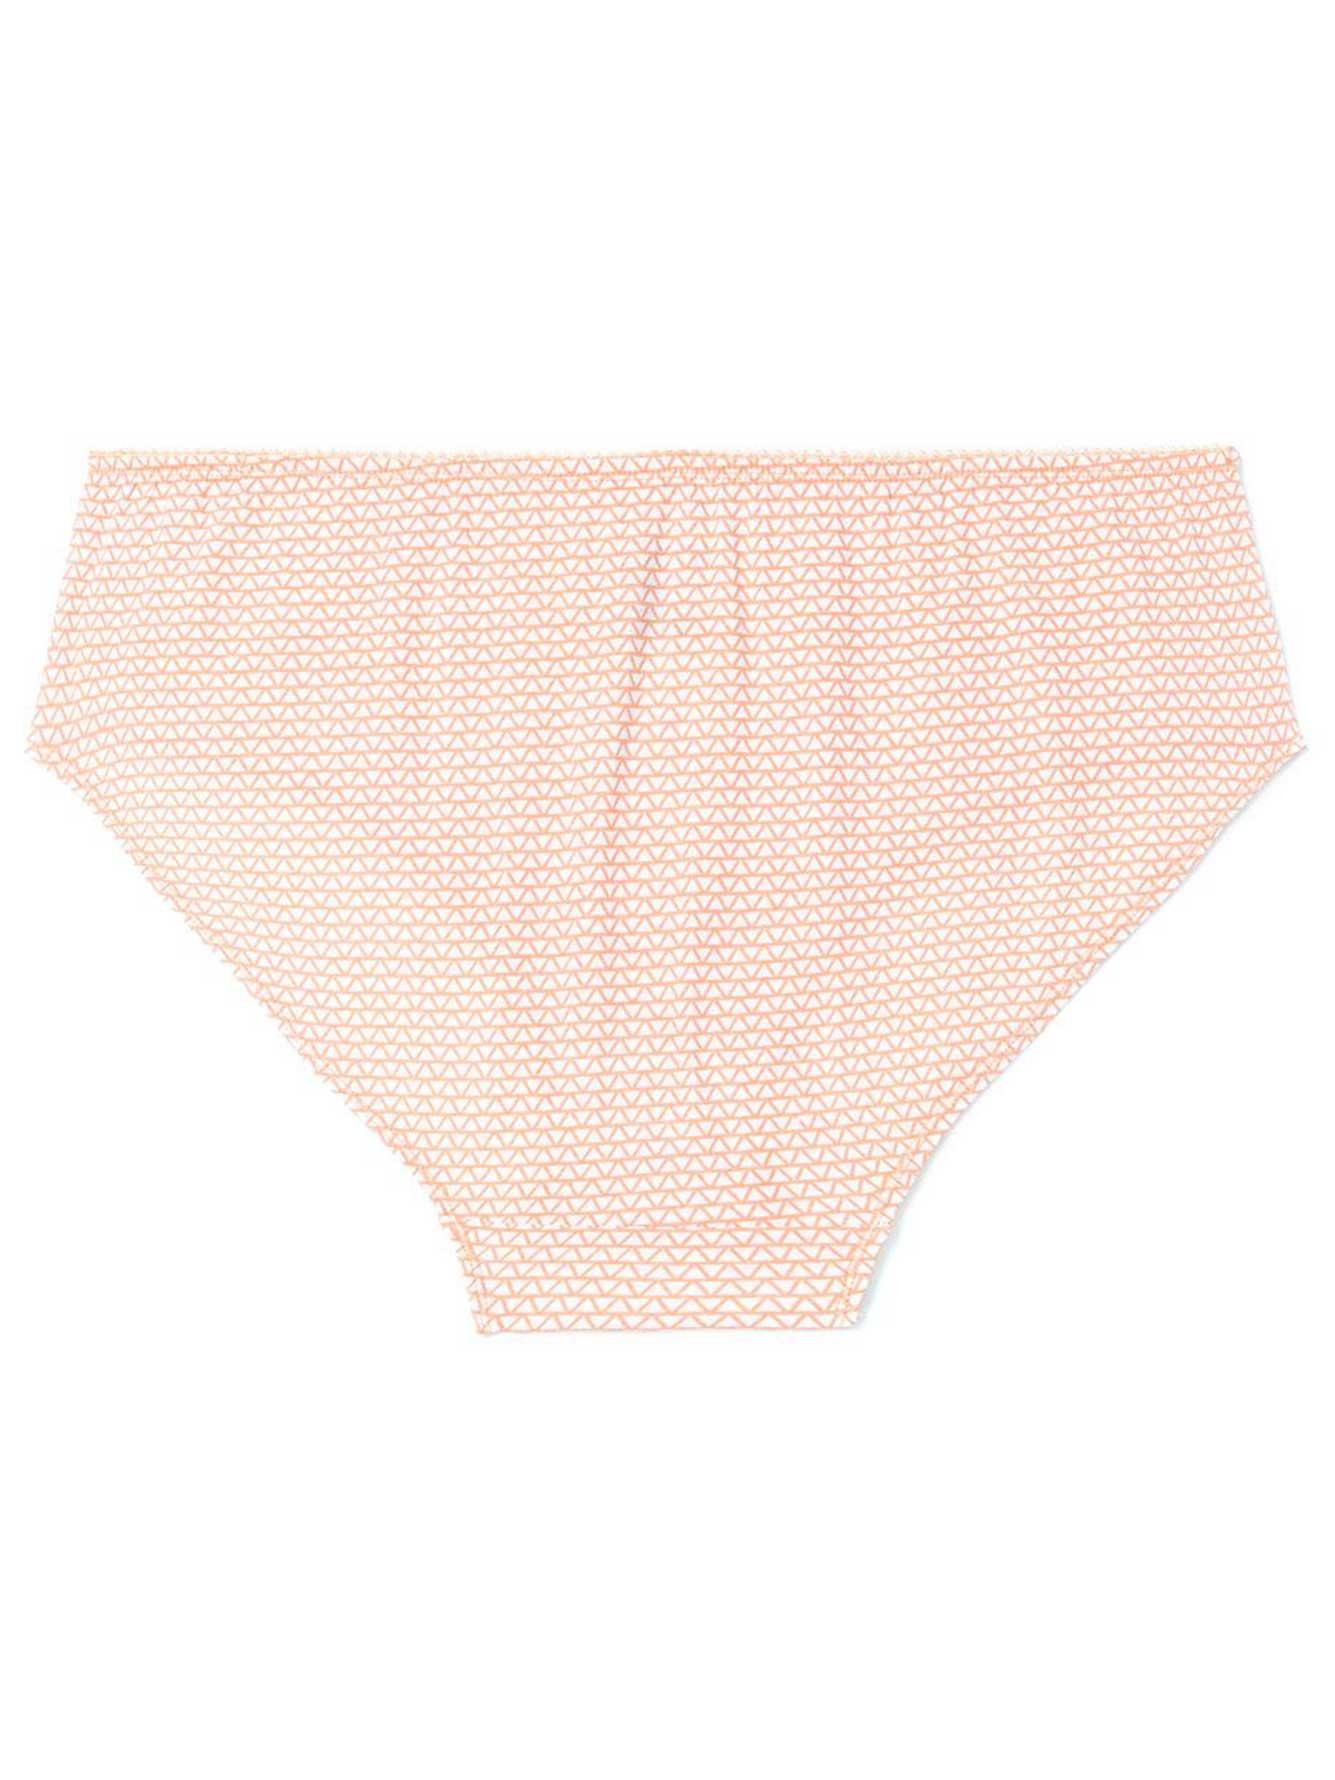 24061033eafd Ti Voglio Printed Cotton Hipster Panty | Penningtons